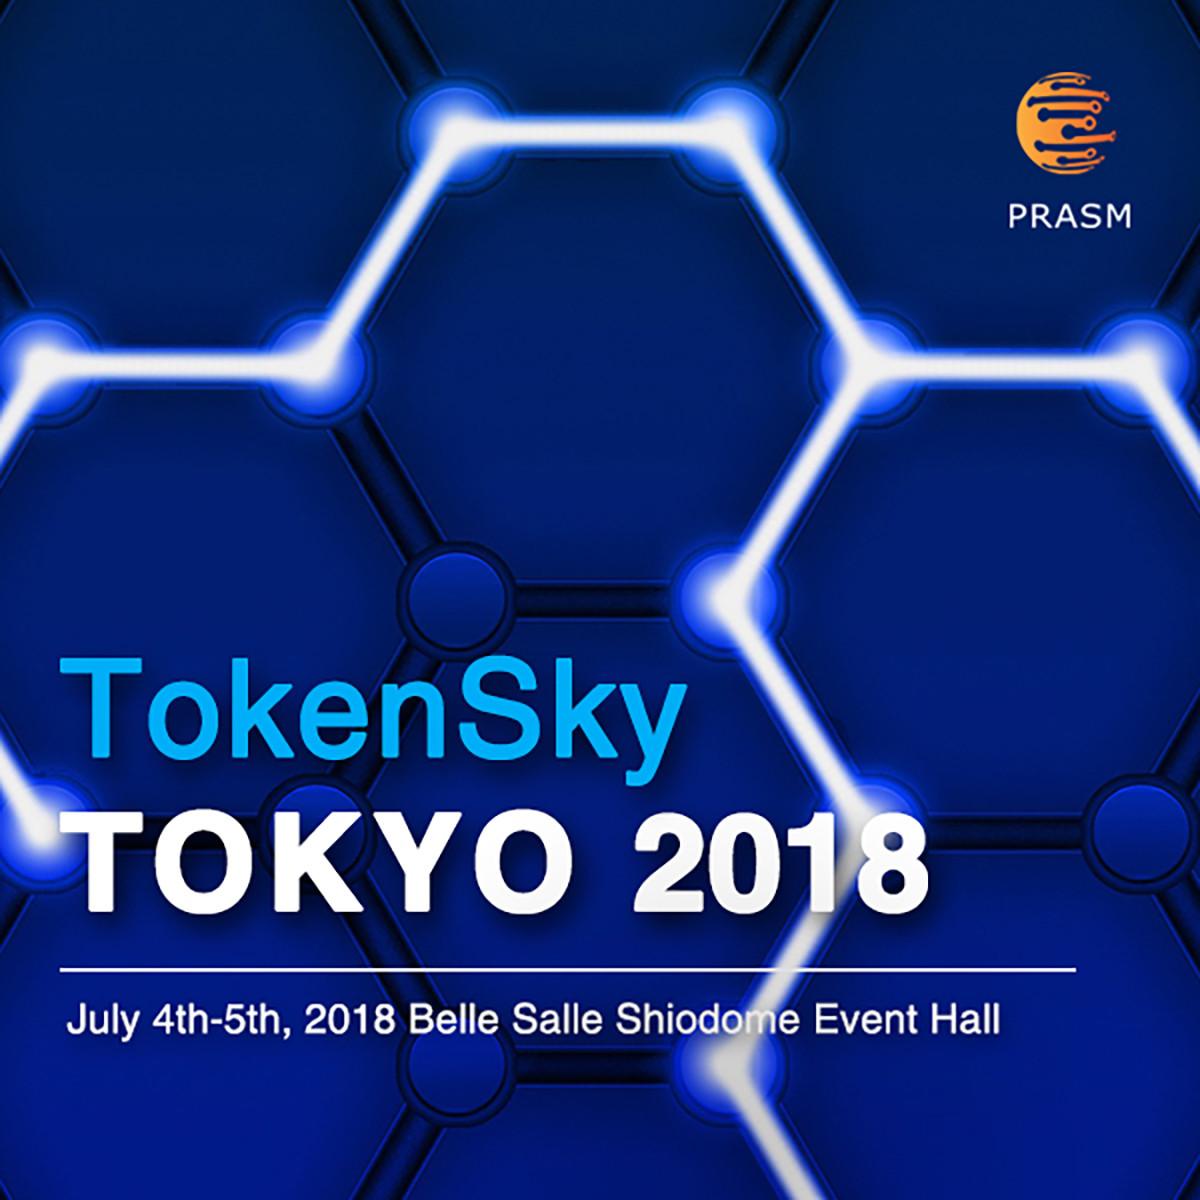 PRASM 參加 Chainers 2018 和 TokenSky Tokyo 2018